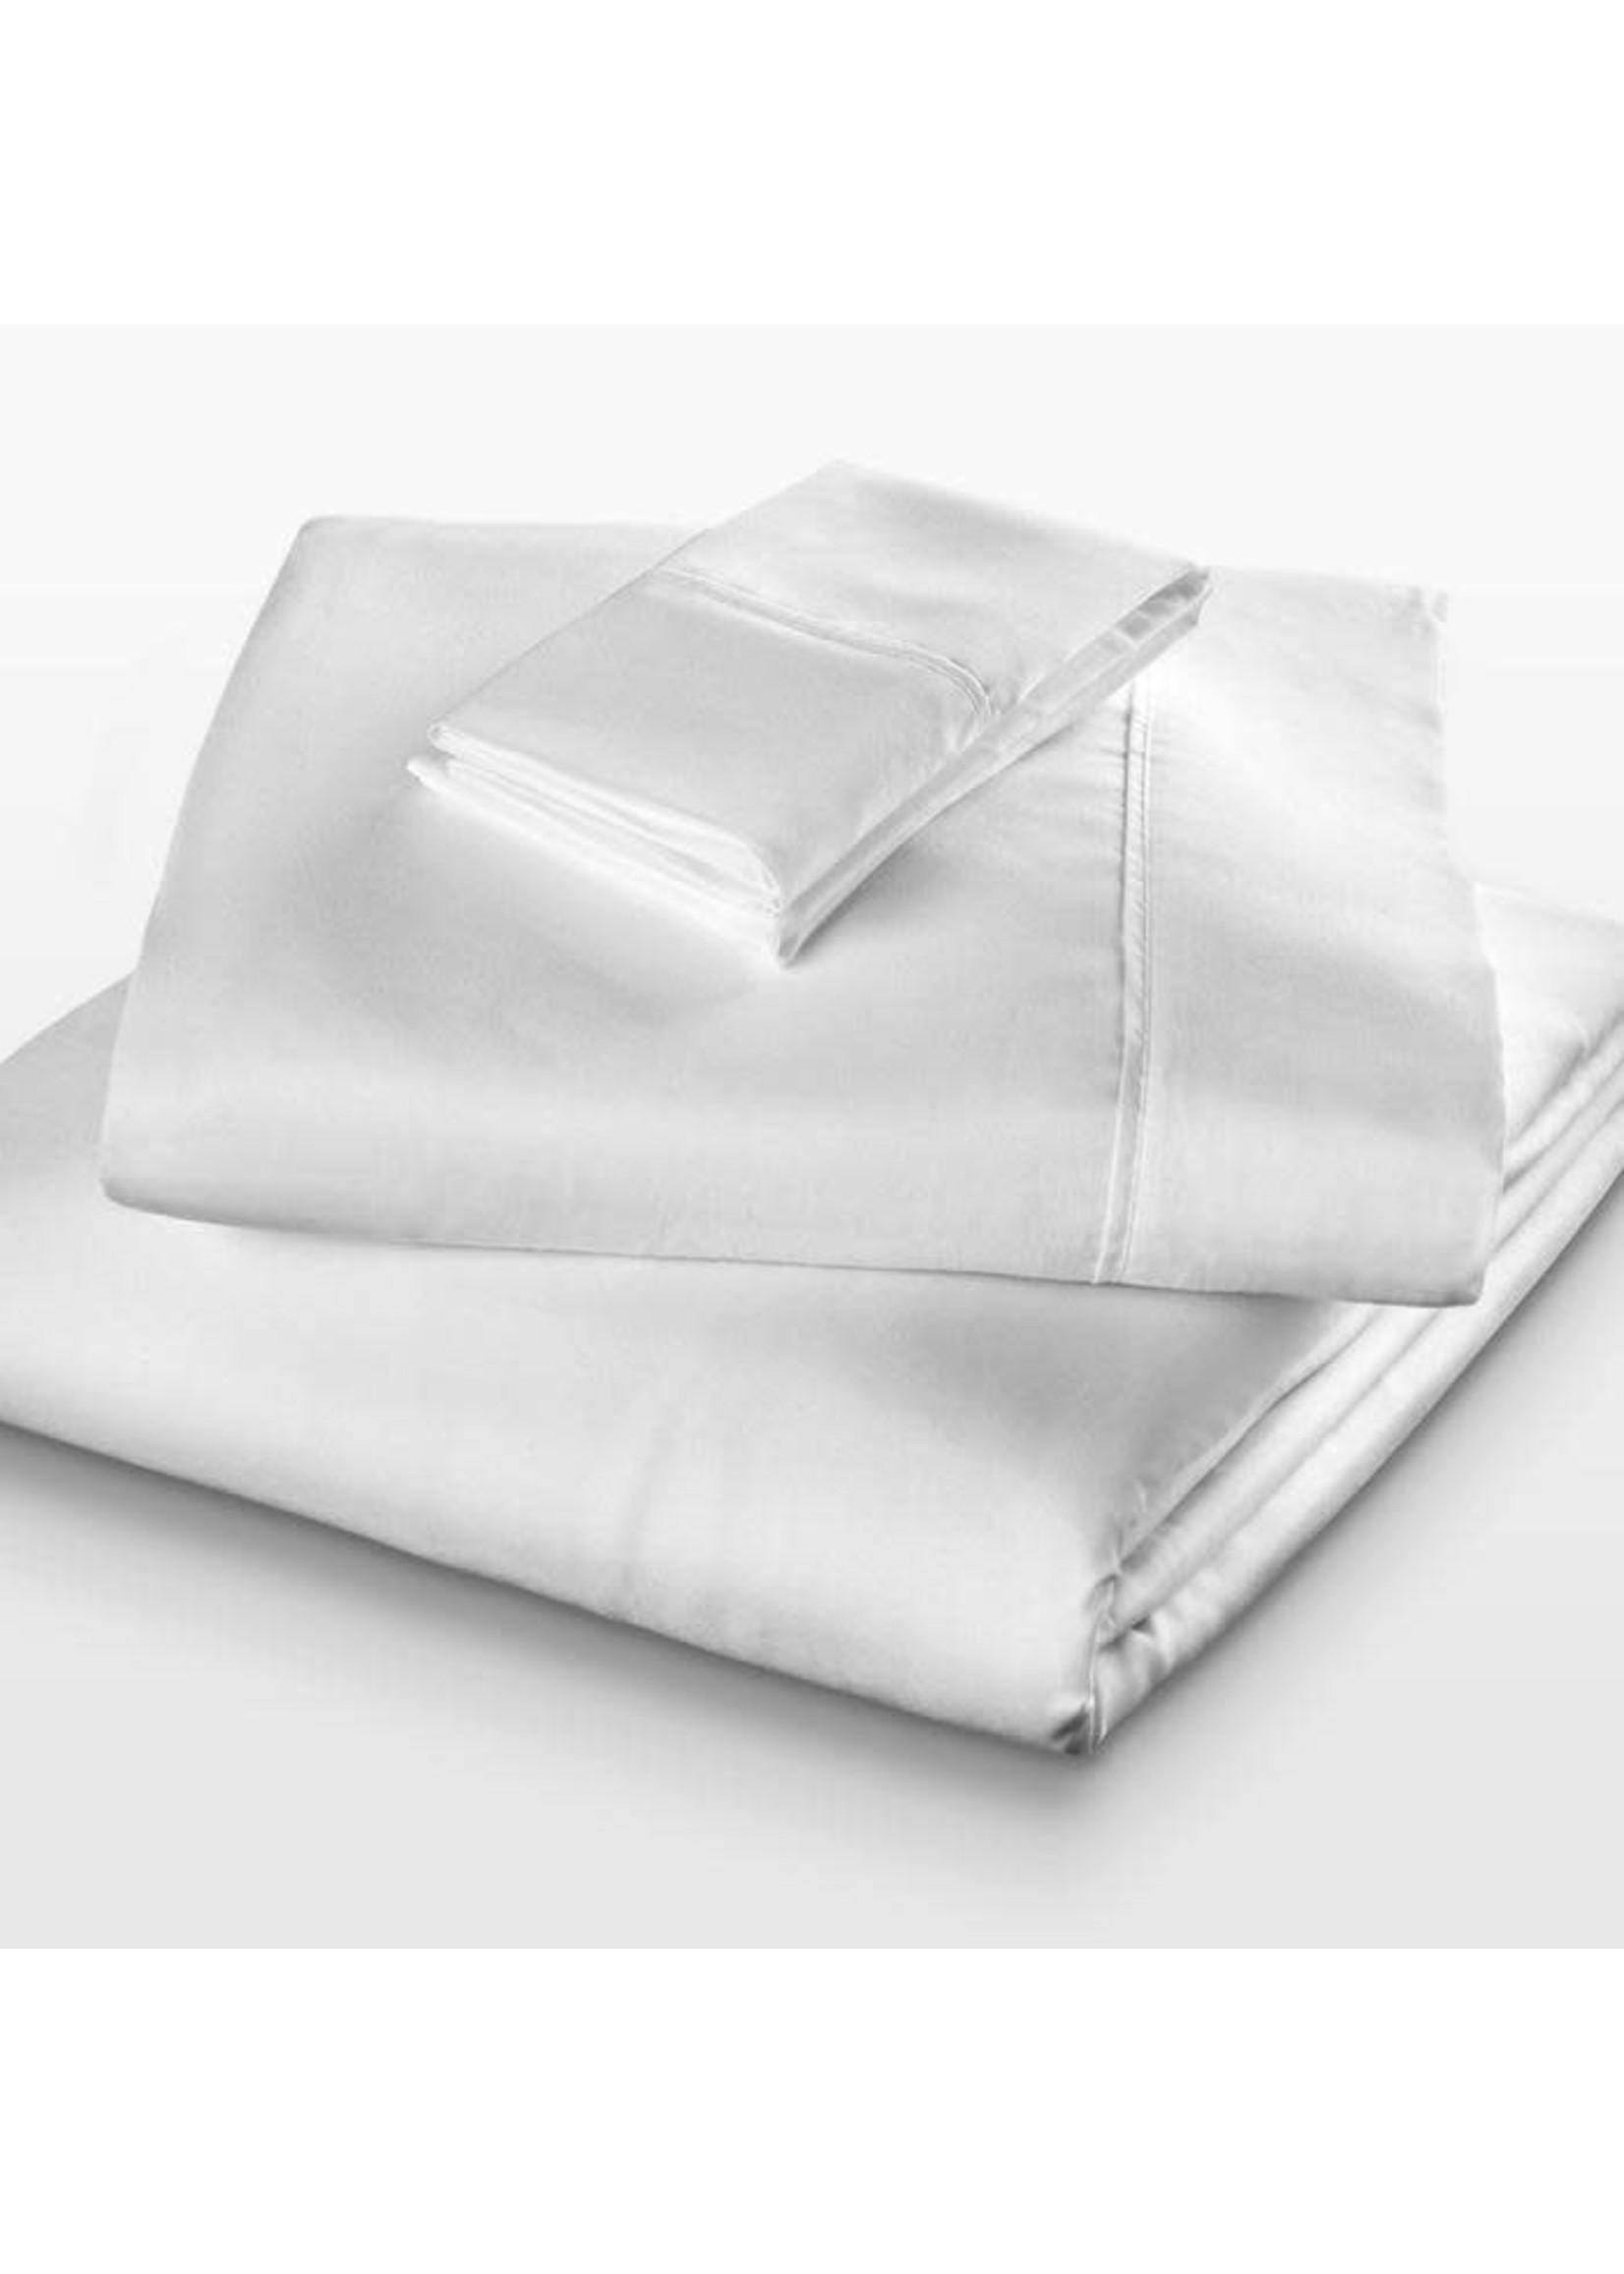 PURECARE MICROFIBER LITE SHEET SET FULL WHITE